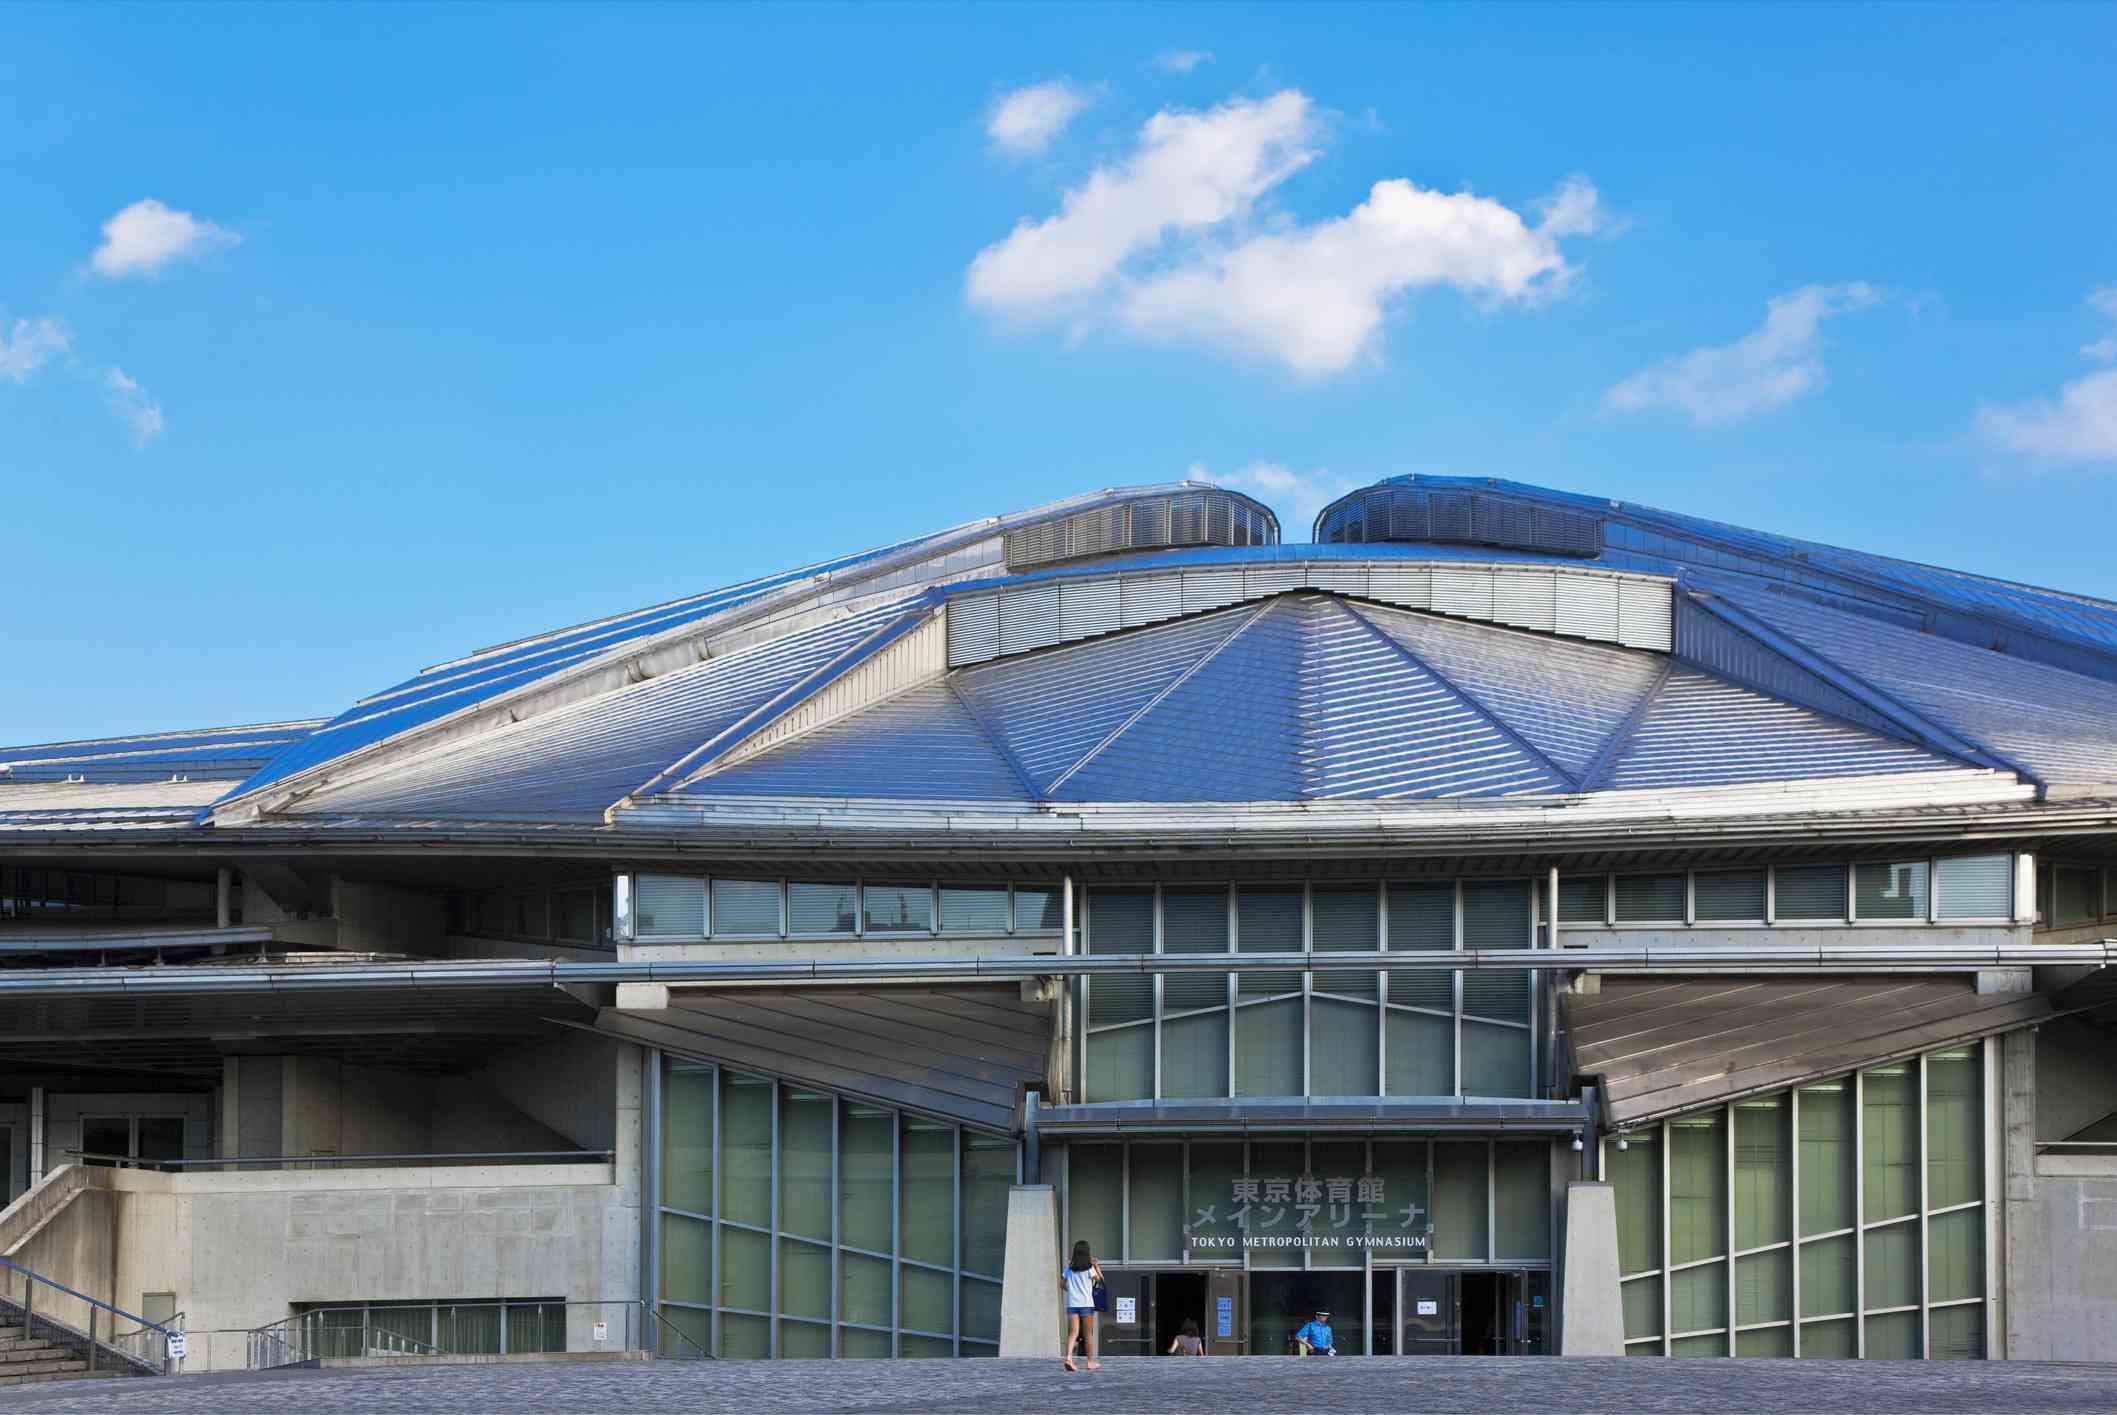 Main Arena at Metropolitan Gymnasium in the Sendagaya District of Shibuya Ward in Tokyo, Japan